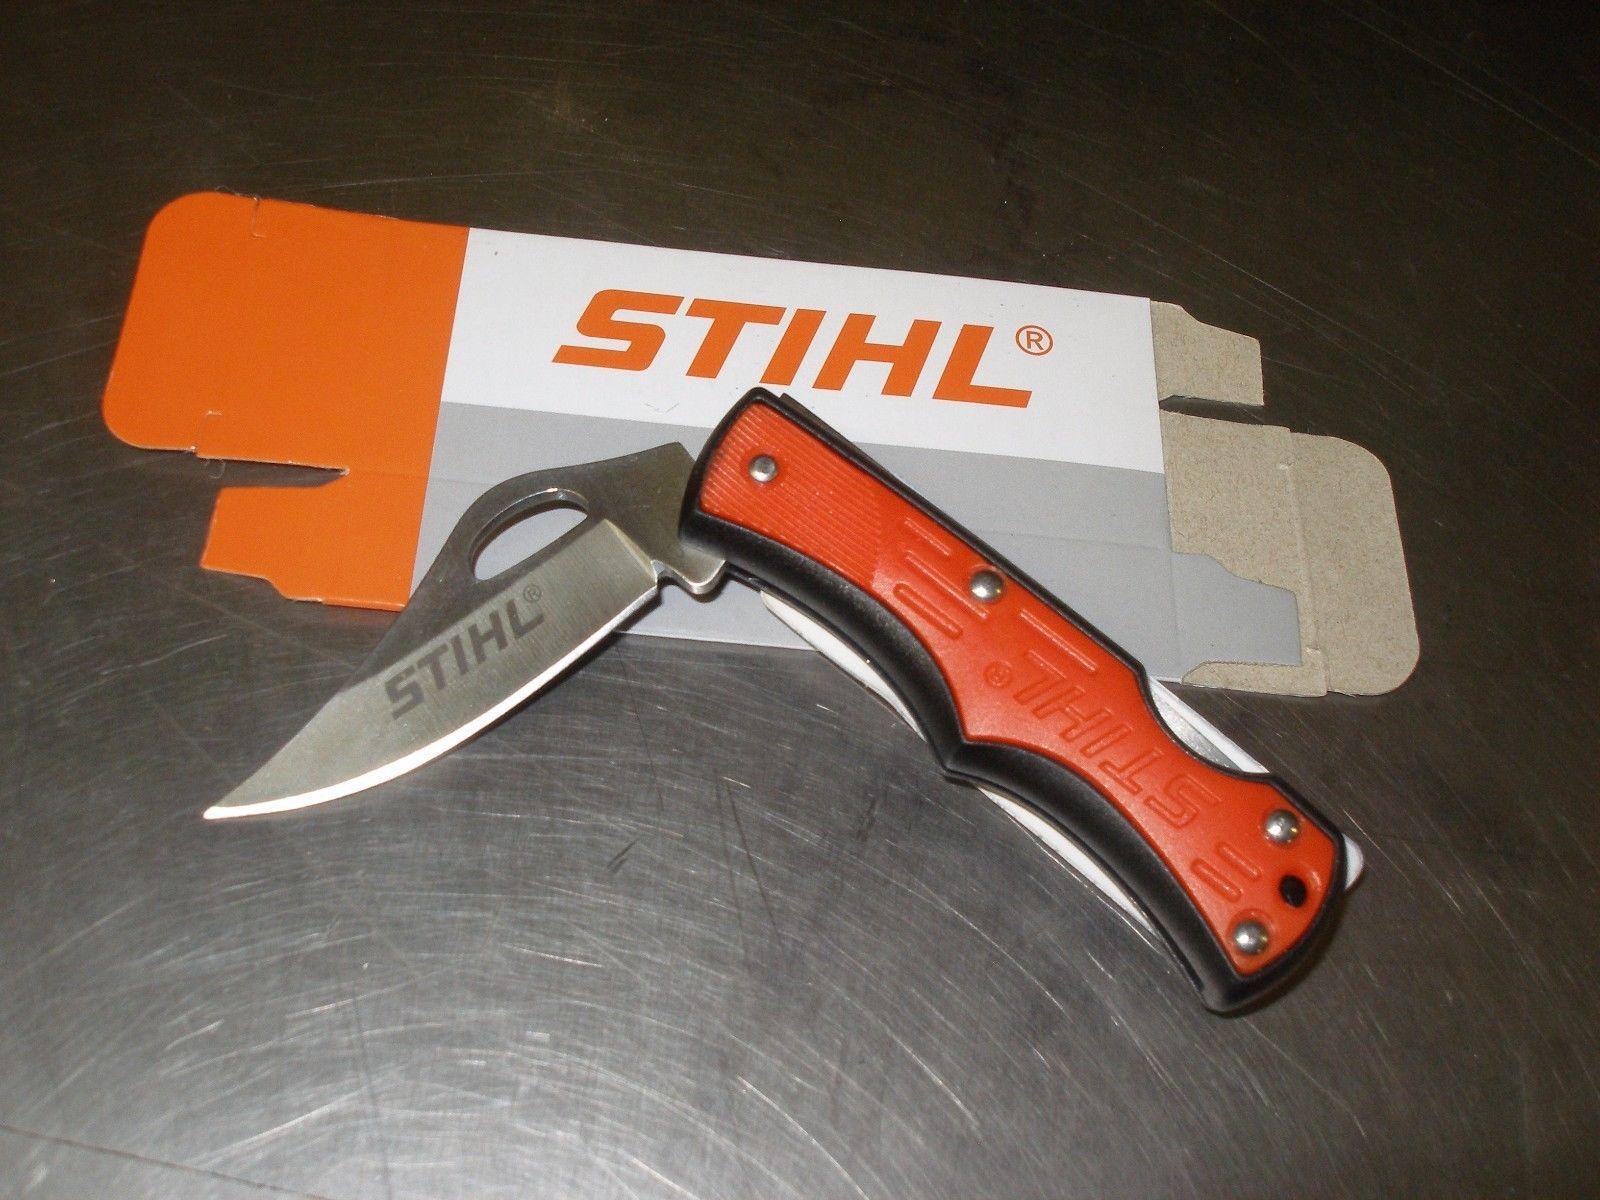 New stihl knife lock blade in box chainsaw trimmer blower power tool new stihl knife lock blade in box chainsaw trimmer blower power tool keyboard keysfo Images